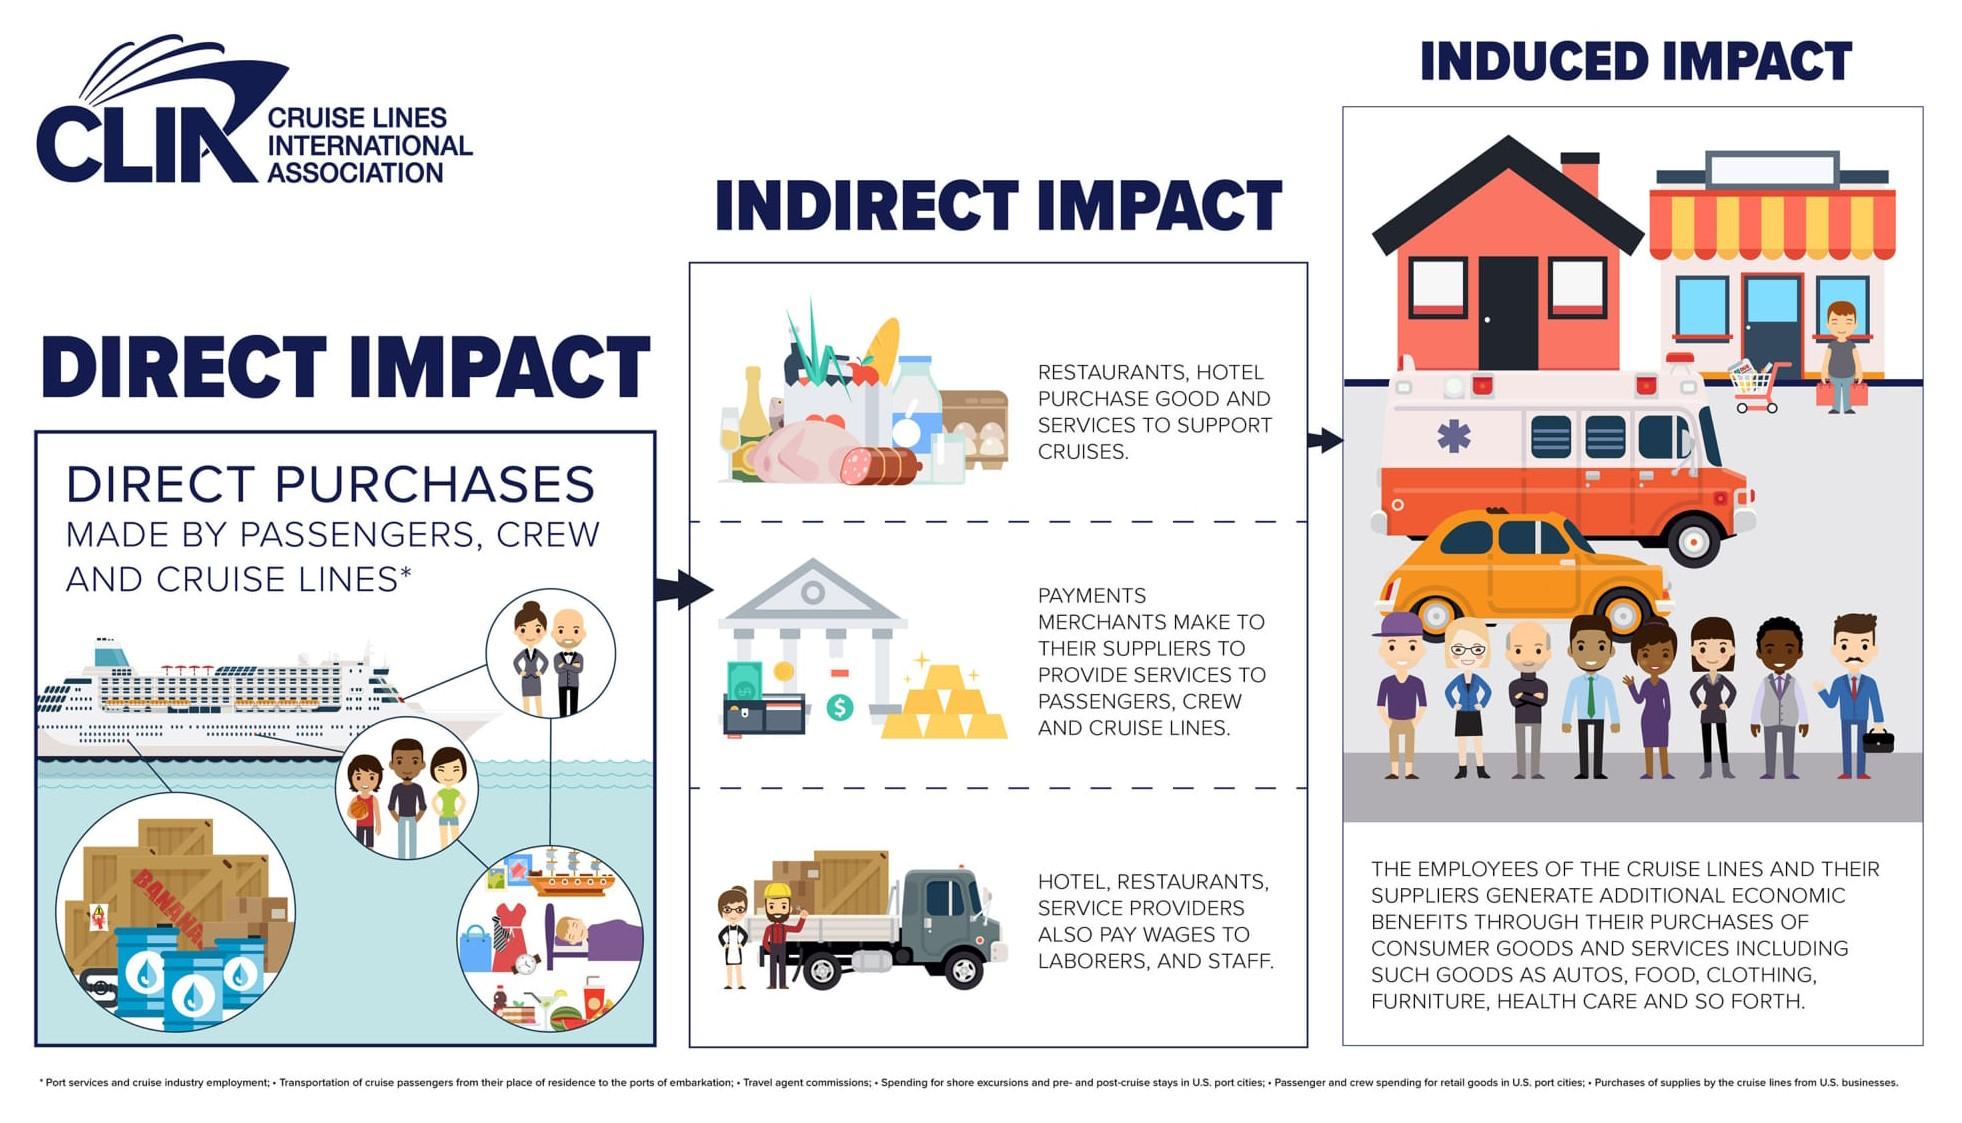 Infographic courtesy of CLIA